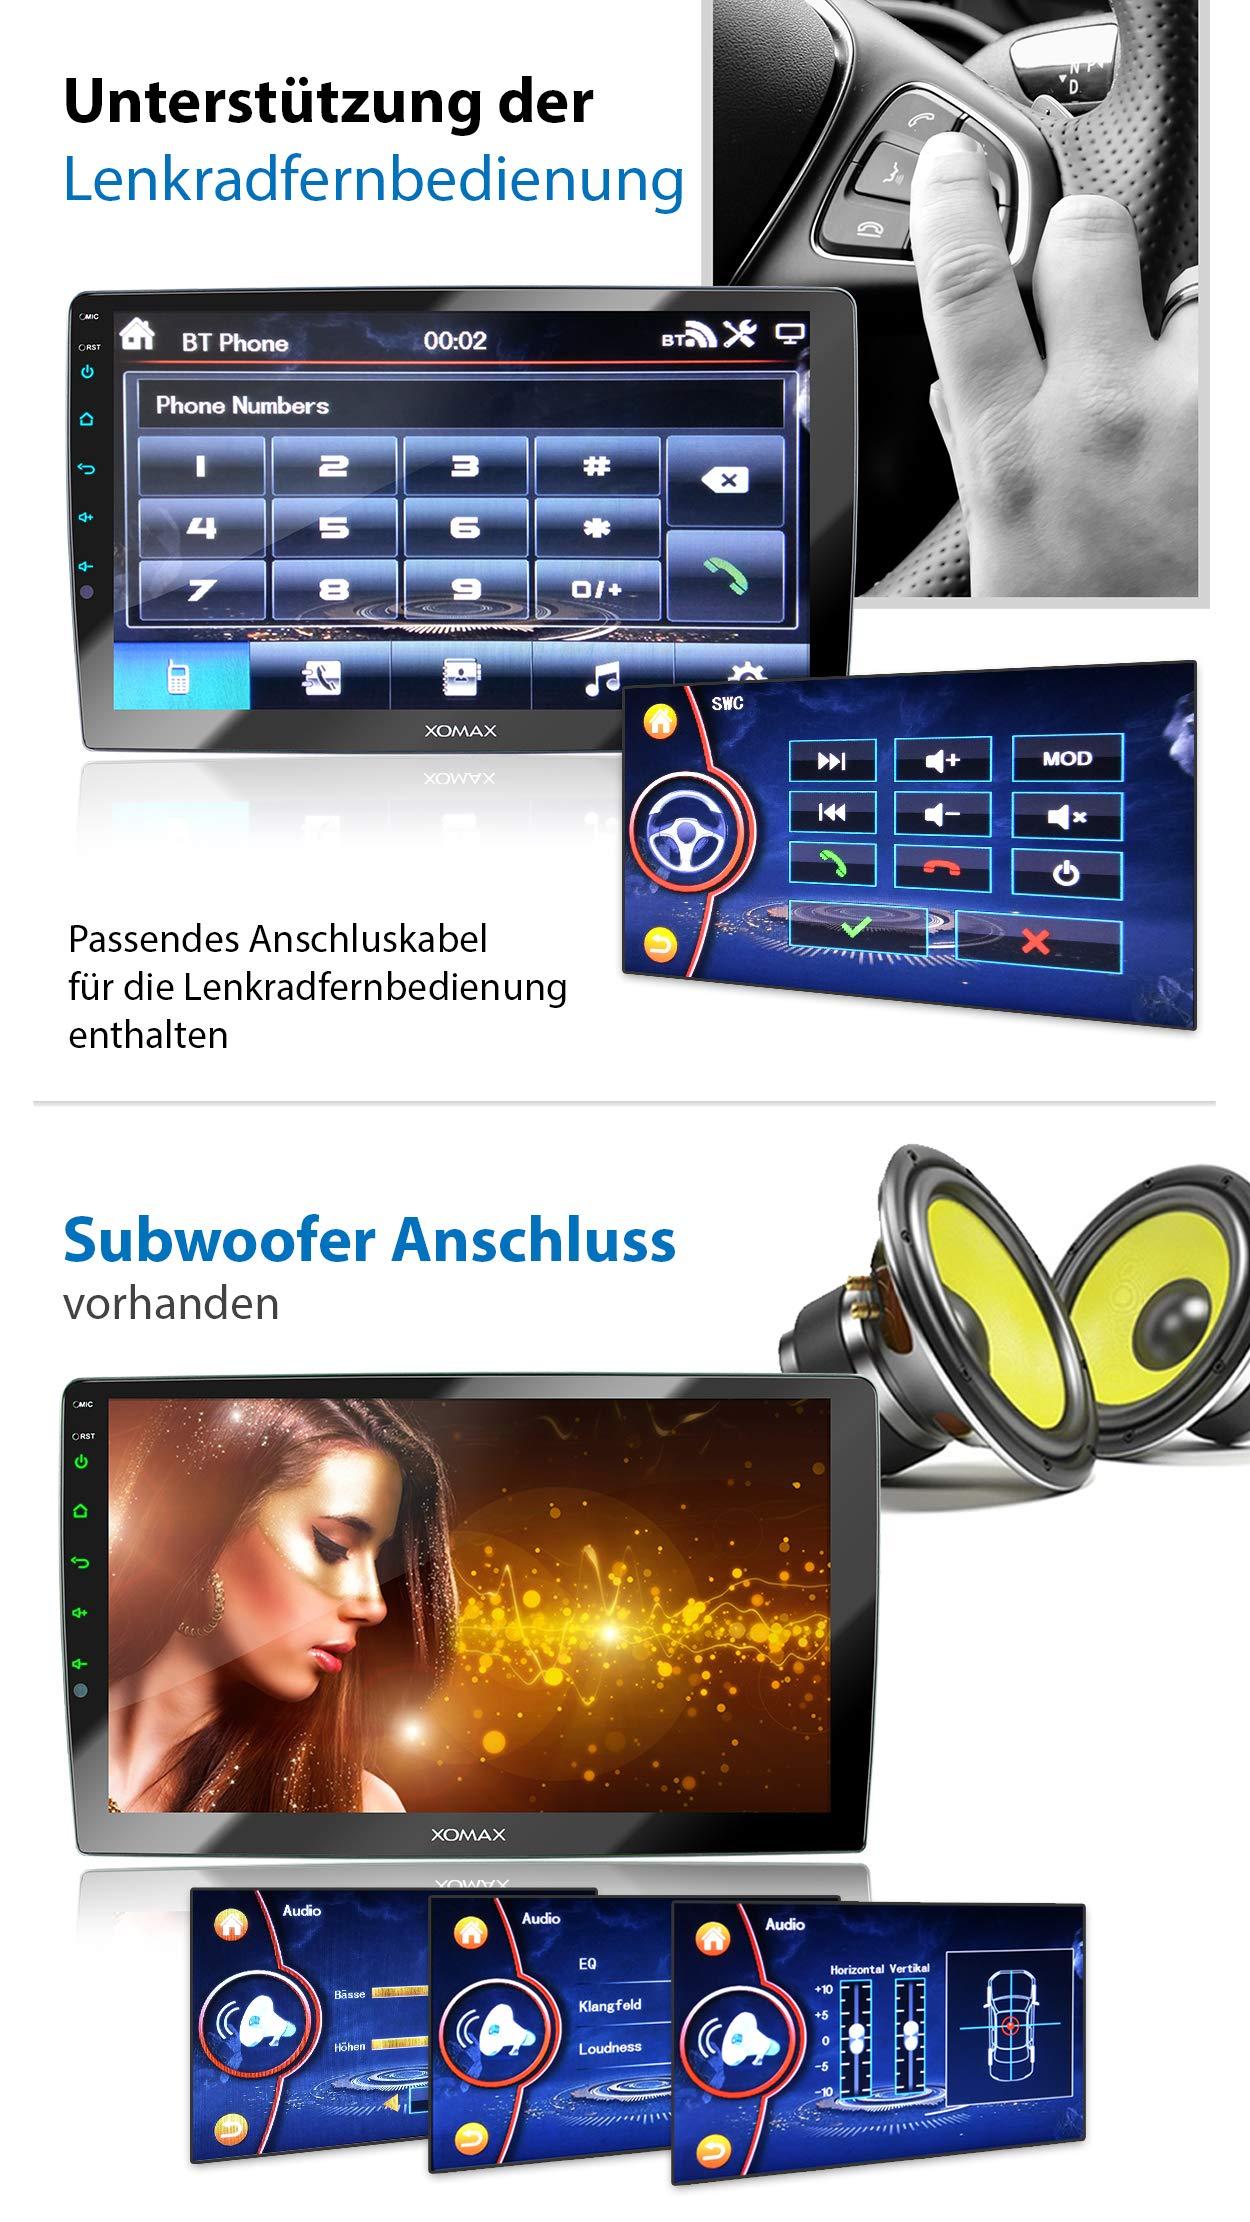 XOMAX-XM-2VN1003-Autoradio-mit-verstellbarem-XXL-Touchscreen-Bildschirm-1025-cm-I-Mirrorlink-I-GPS-Navigation-I-Bluetooth-I-Anschlsse-fr-externes-Mikrofon-und-Rckfahrkamera-I-RDS-I-USB-I-2-DIN